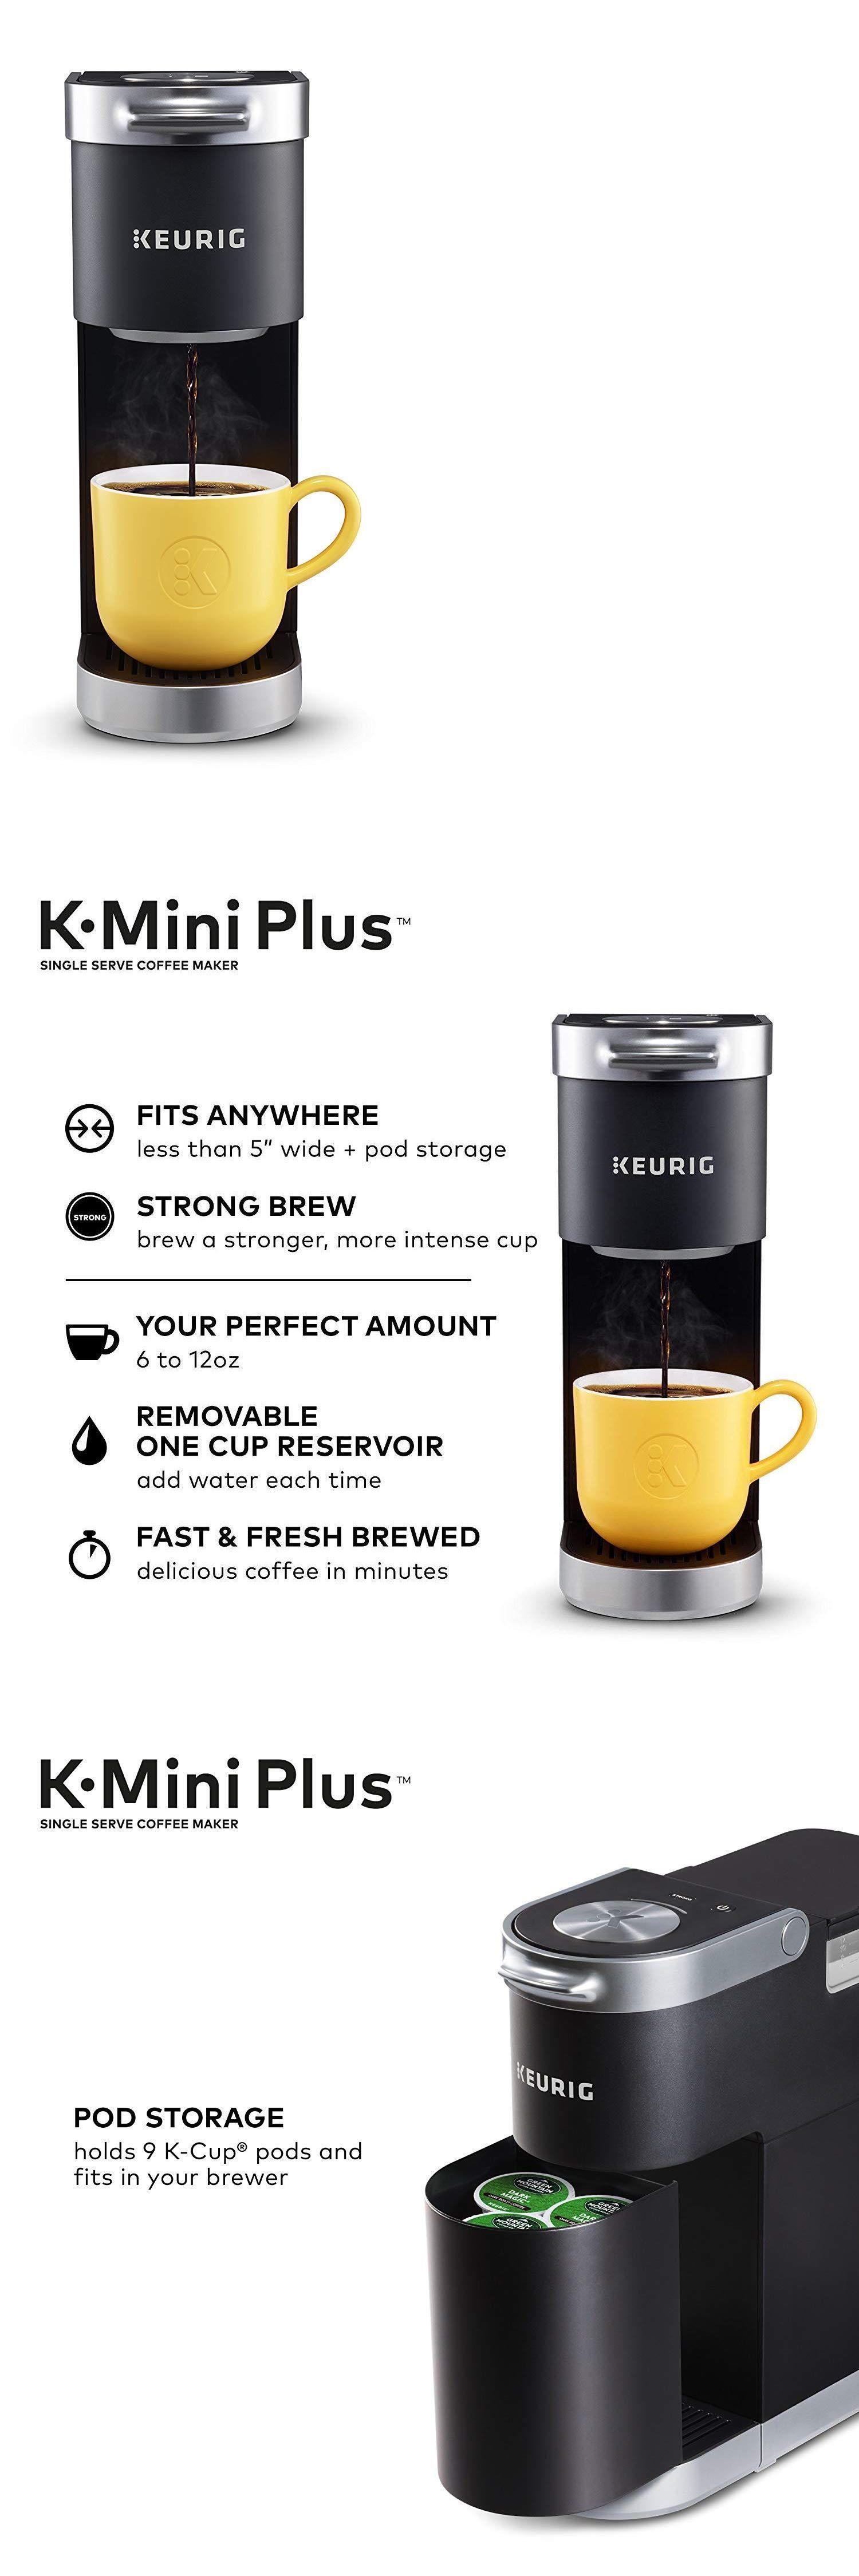 keurig k-mini plus coffee maker single